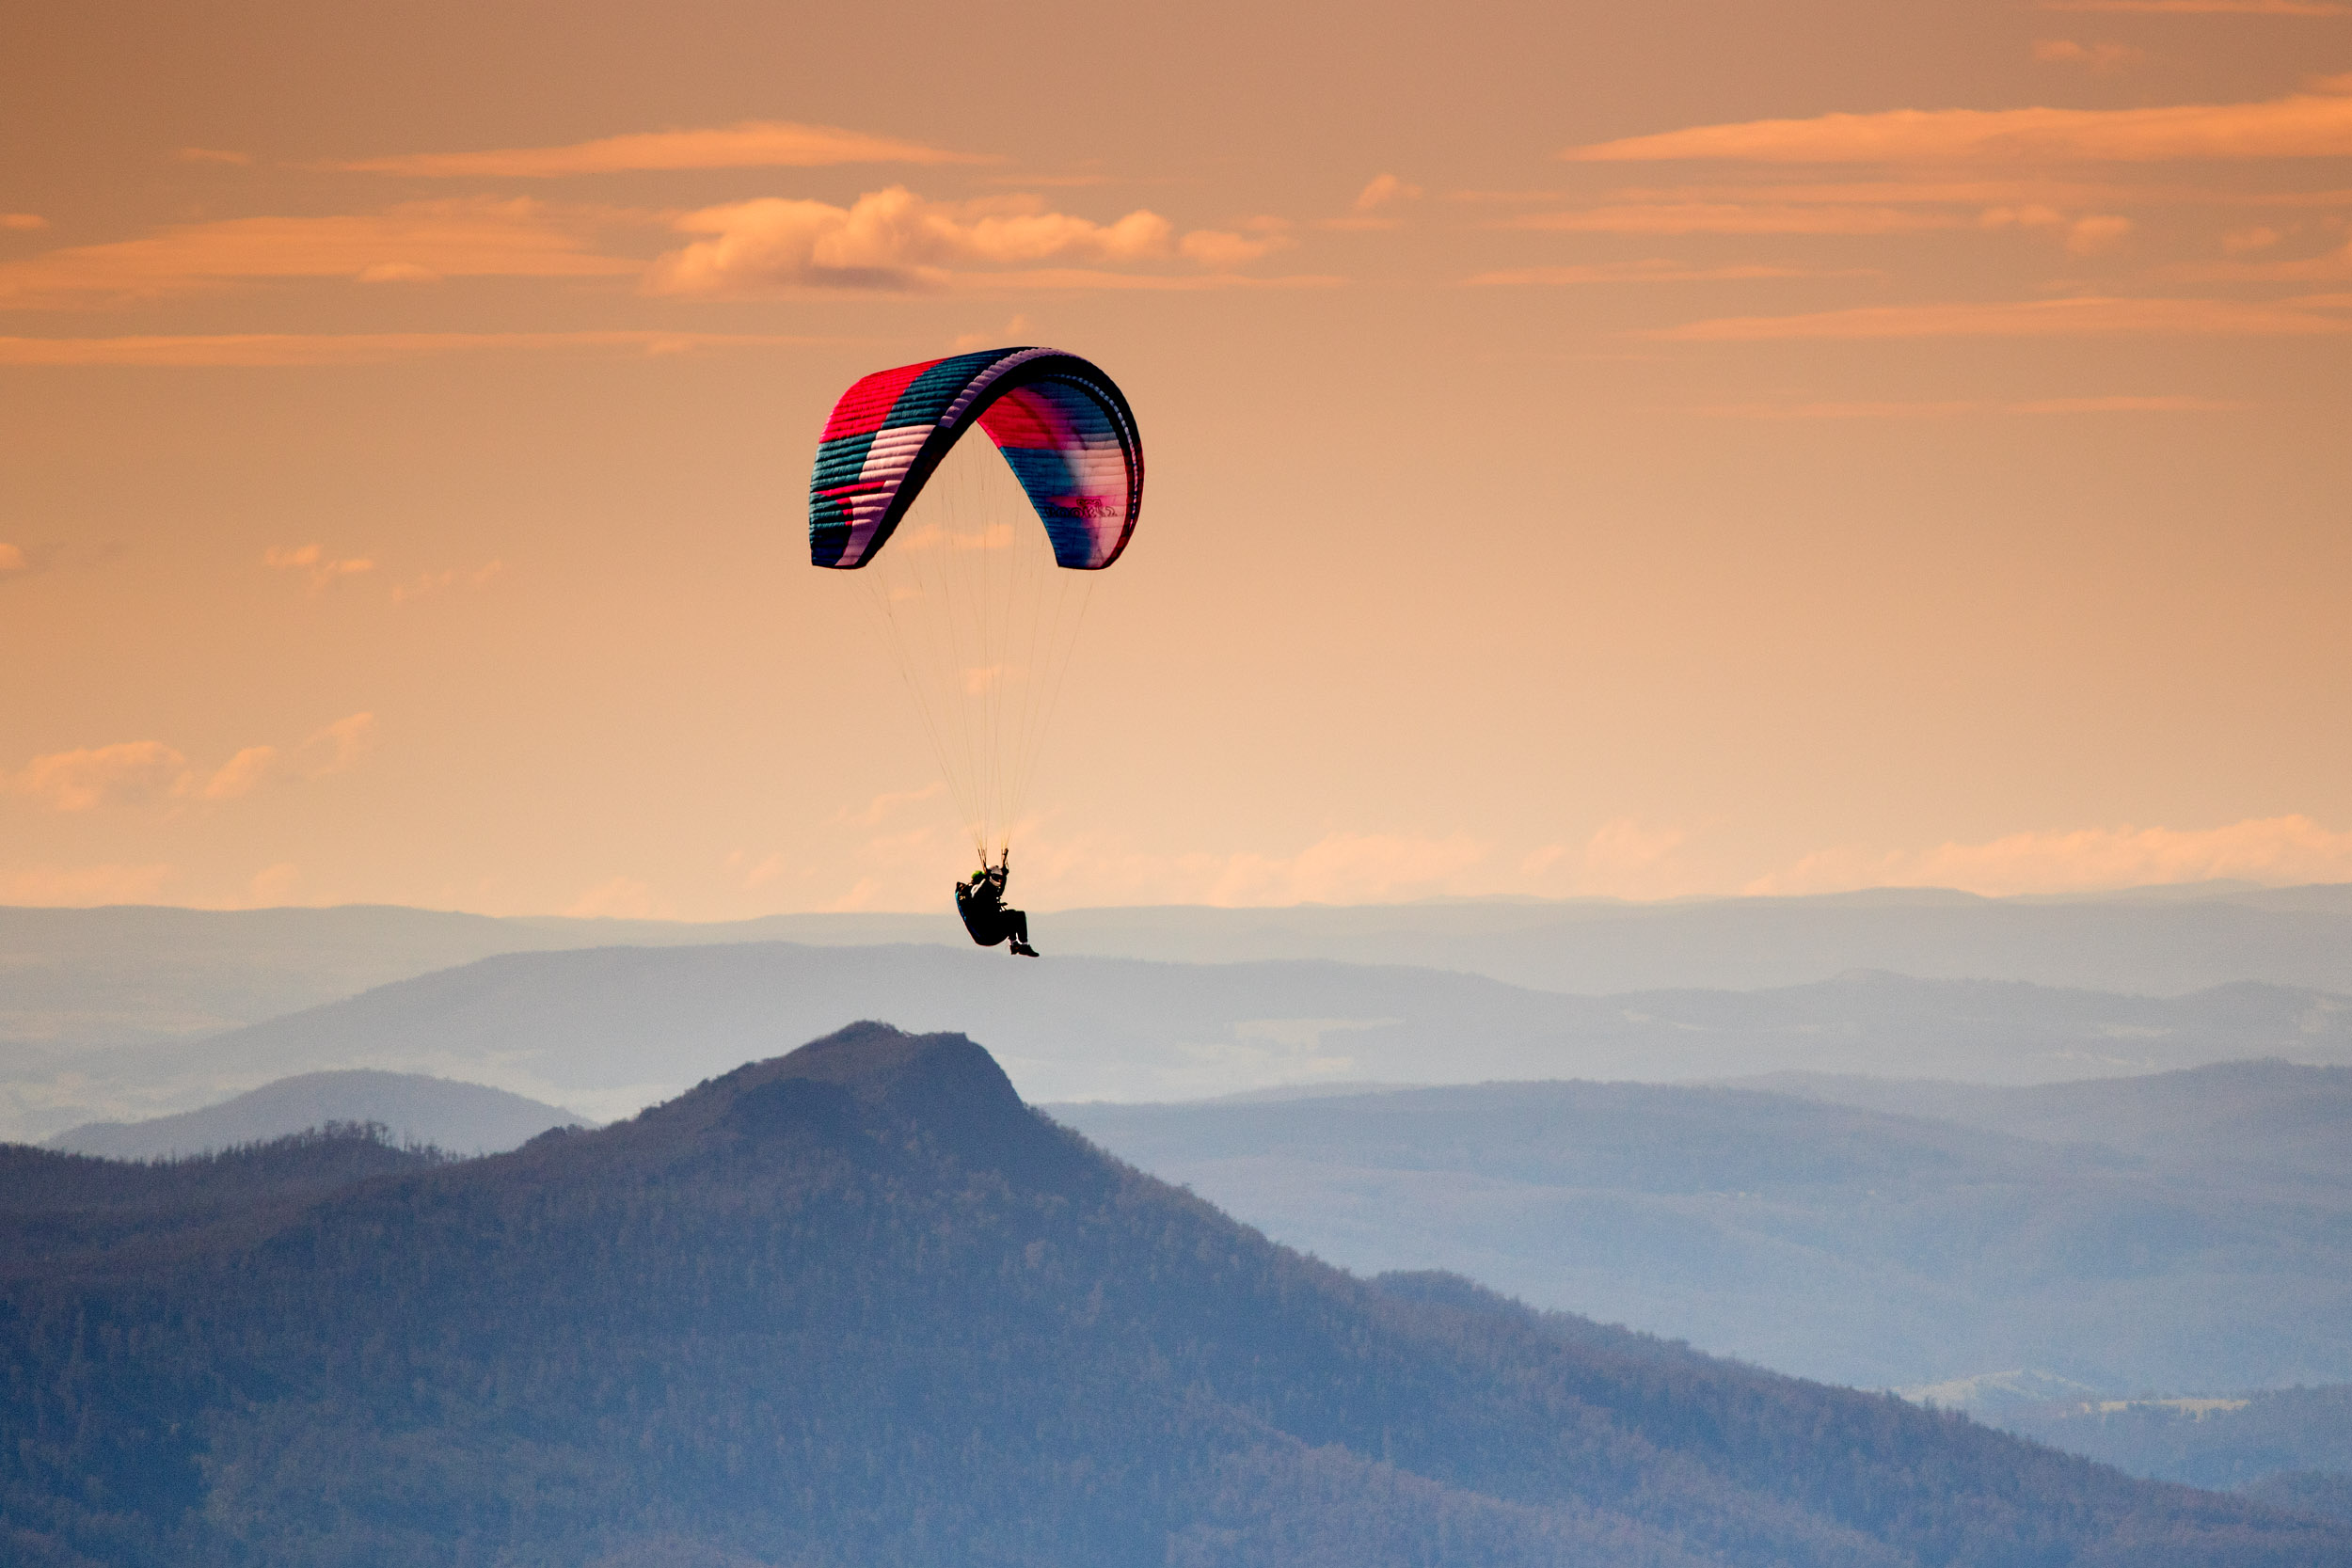 mount-wellington-hang-gliding.jpg